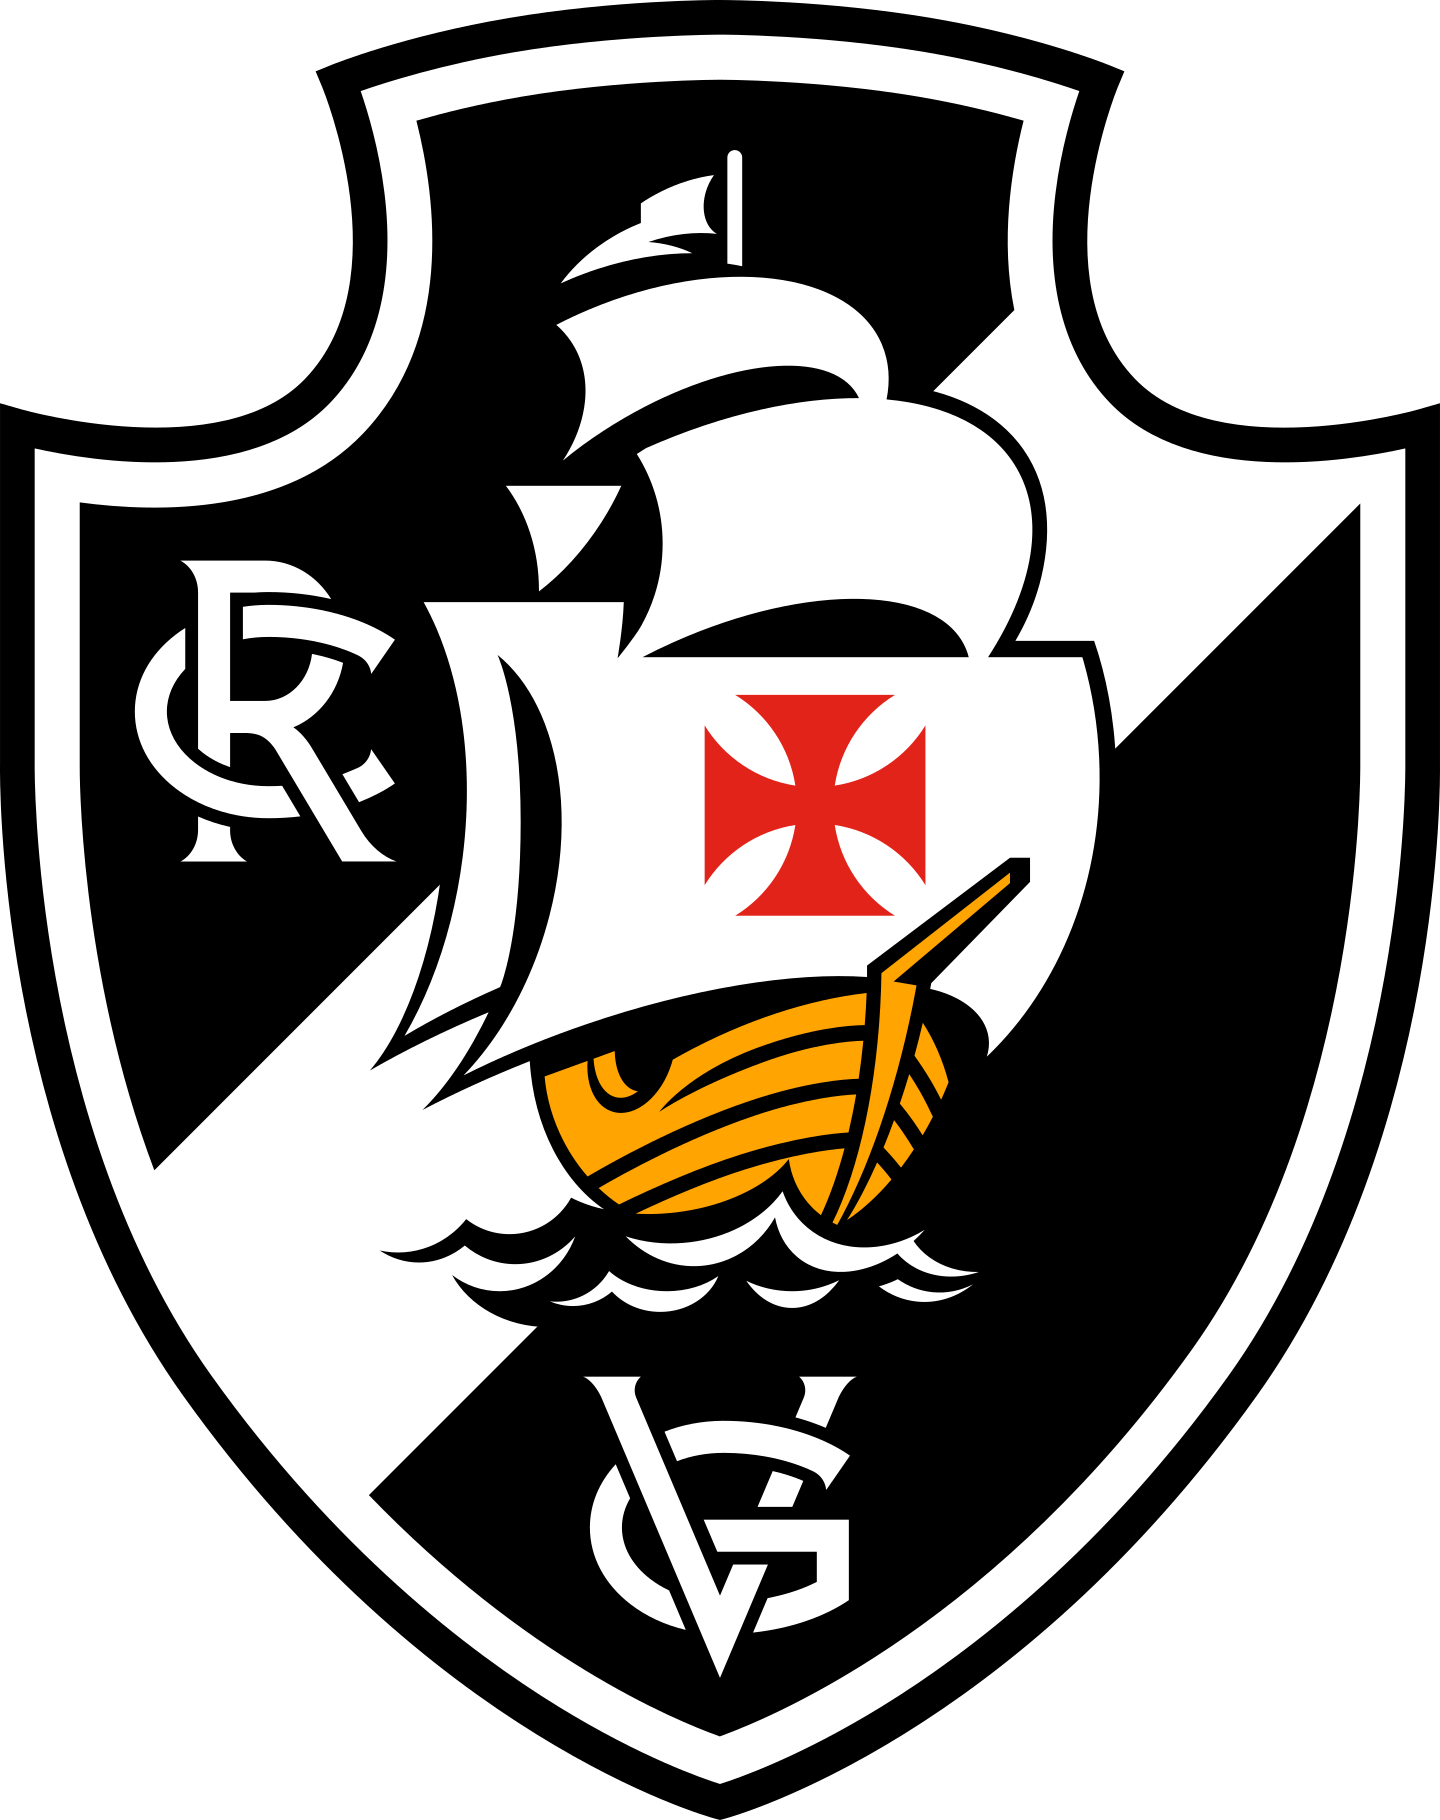 vasco logo 2 - Vasco da Gama Logo - Escudo